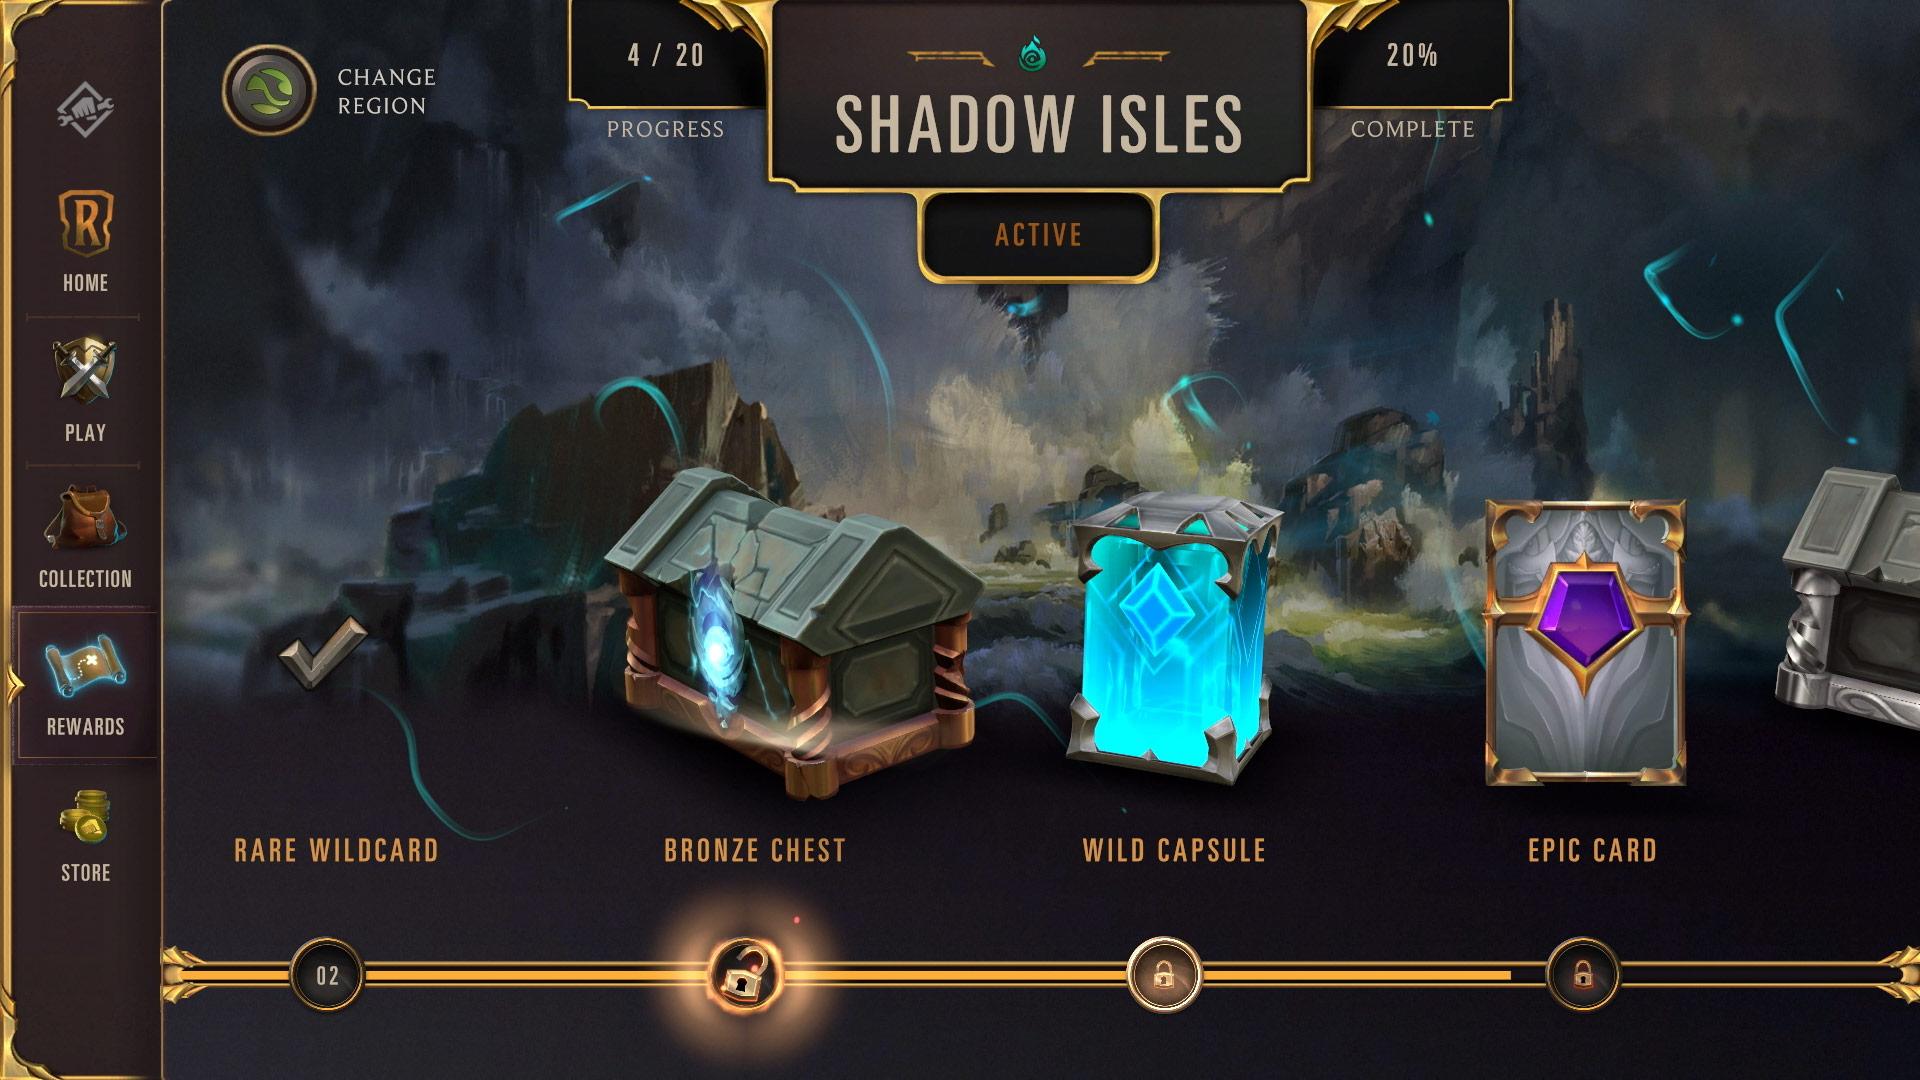 Legends of Runeterra Shadow Isles